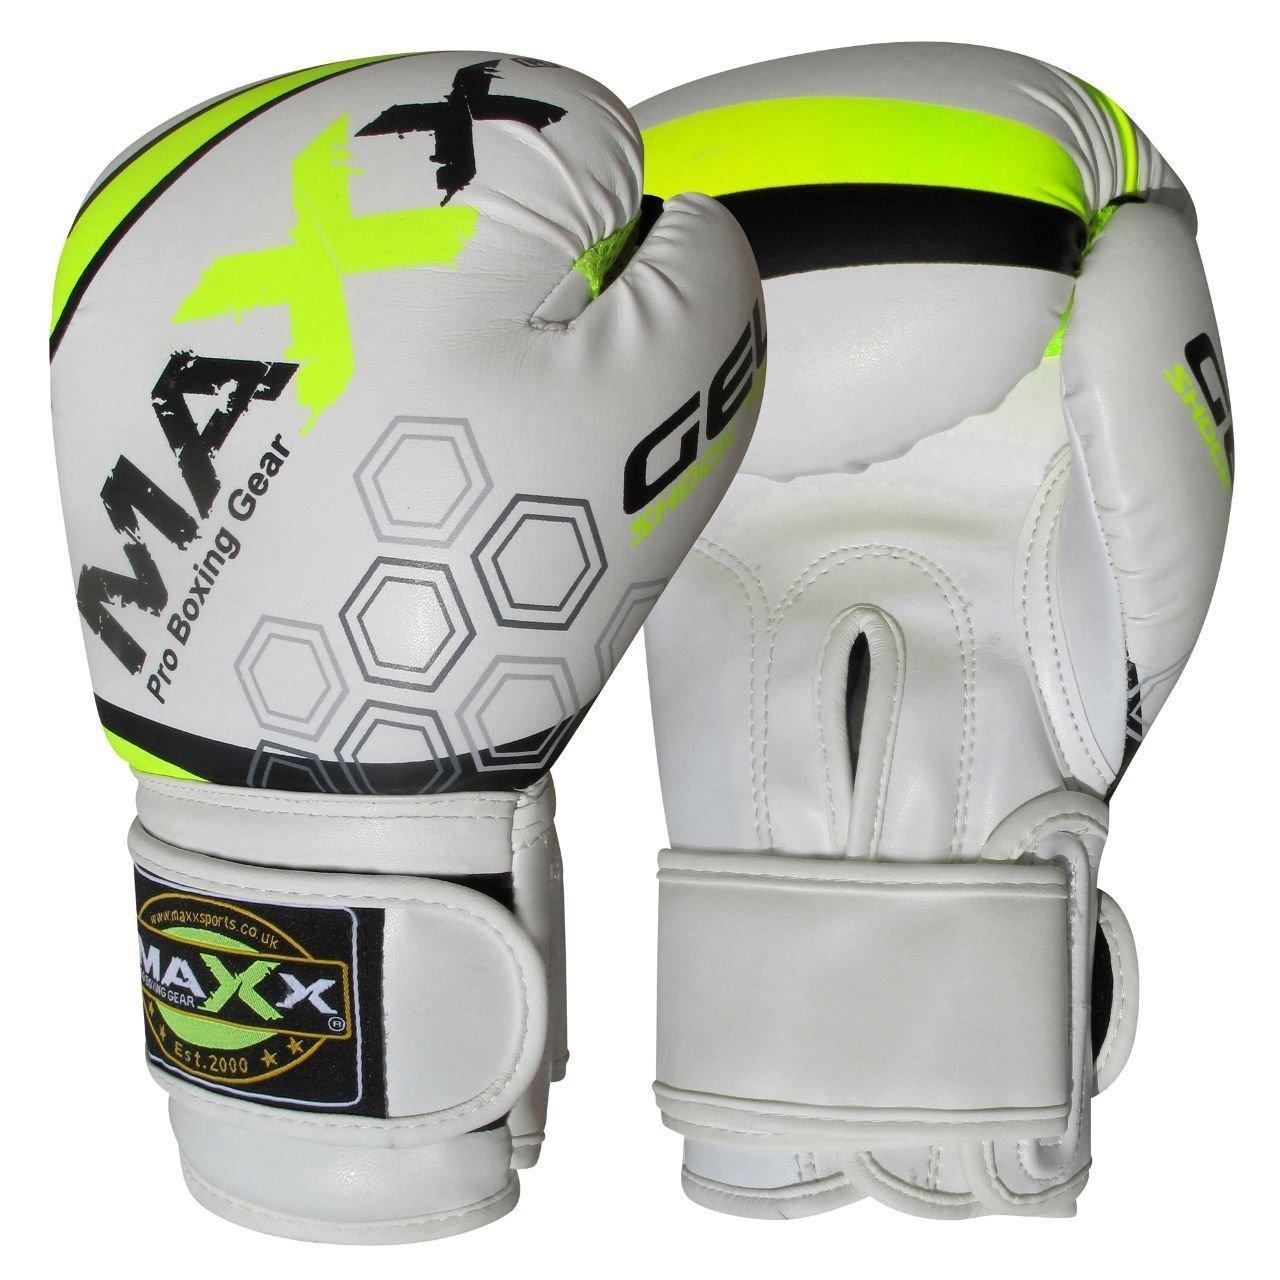 BOOM Prime Green Kids Boxing Gloves 4oz 6oz 8oz Maya Leather Junior Punch Bag Kickboxing Mitts Children Gel Pad MMA Muay Thai Training Sparring